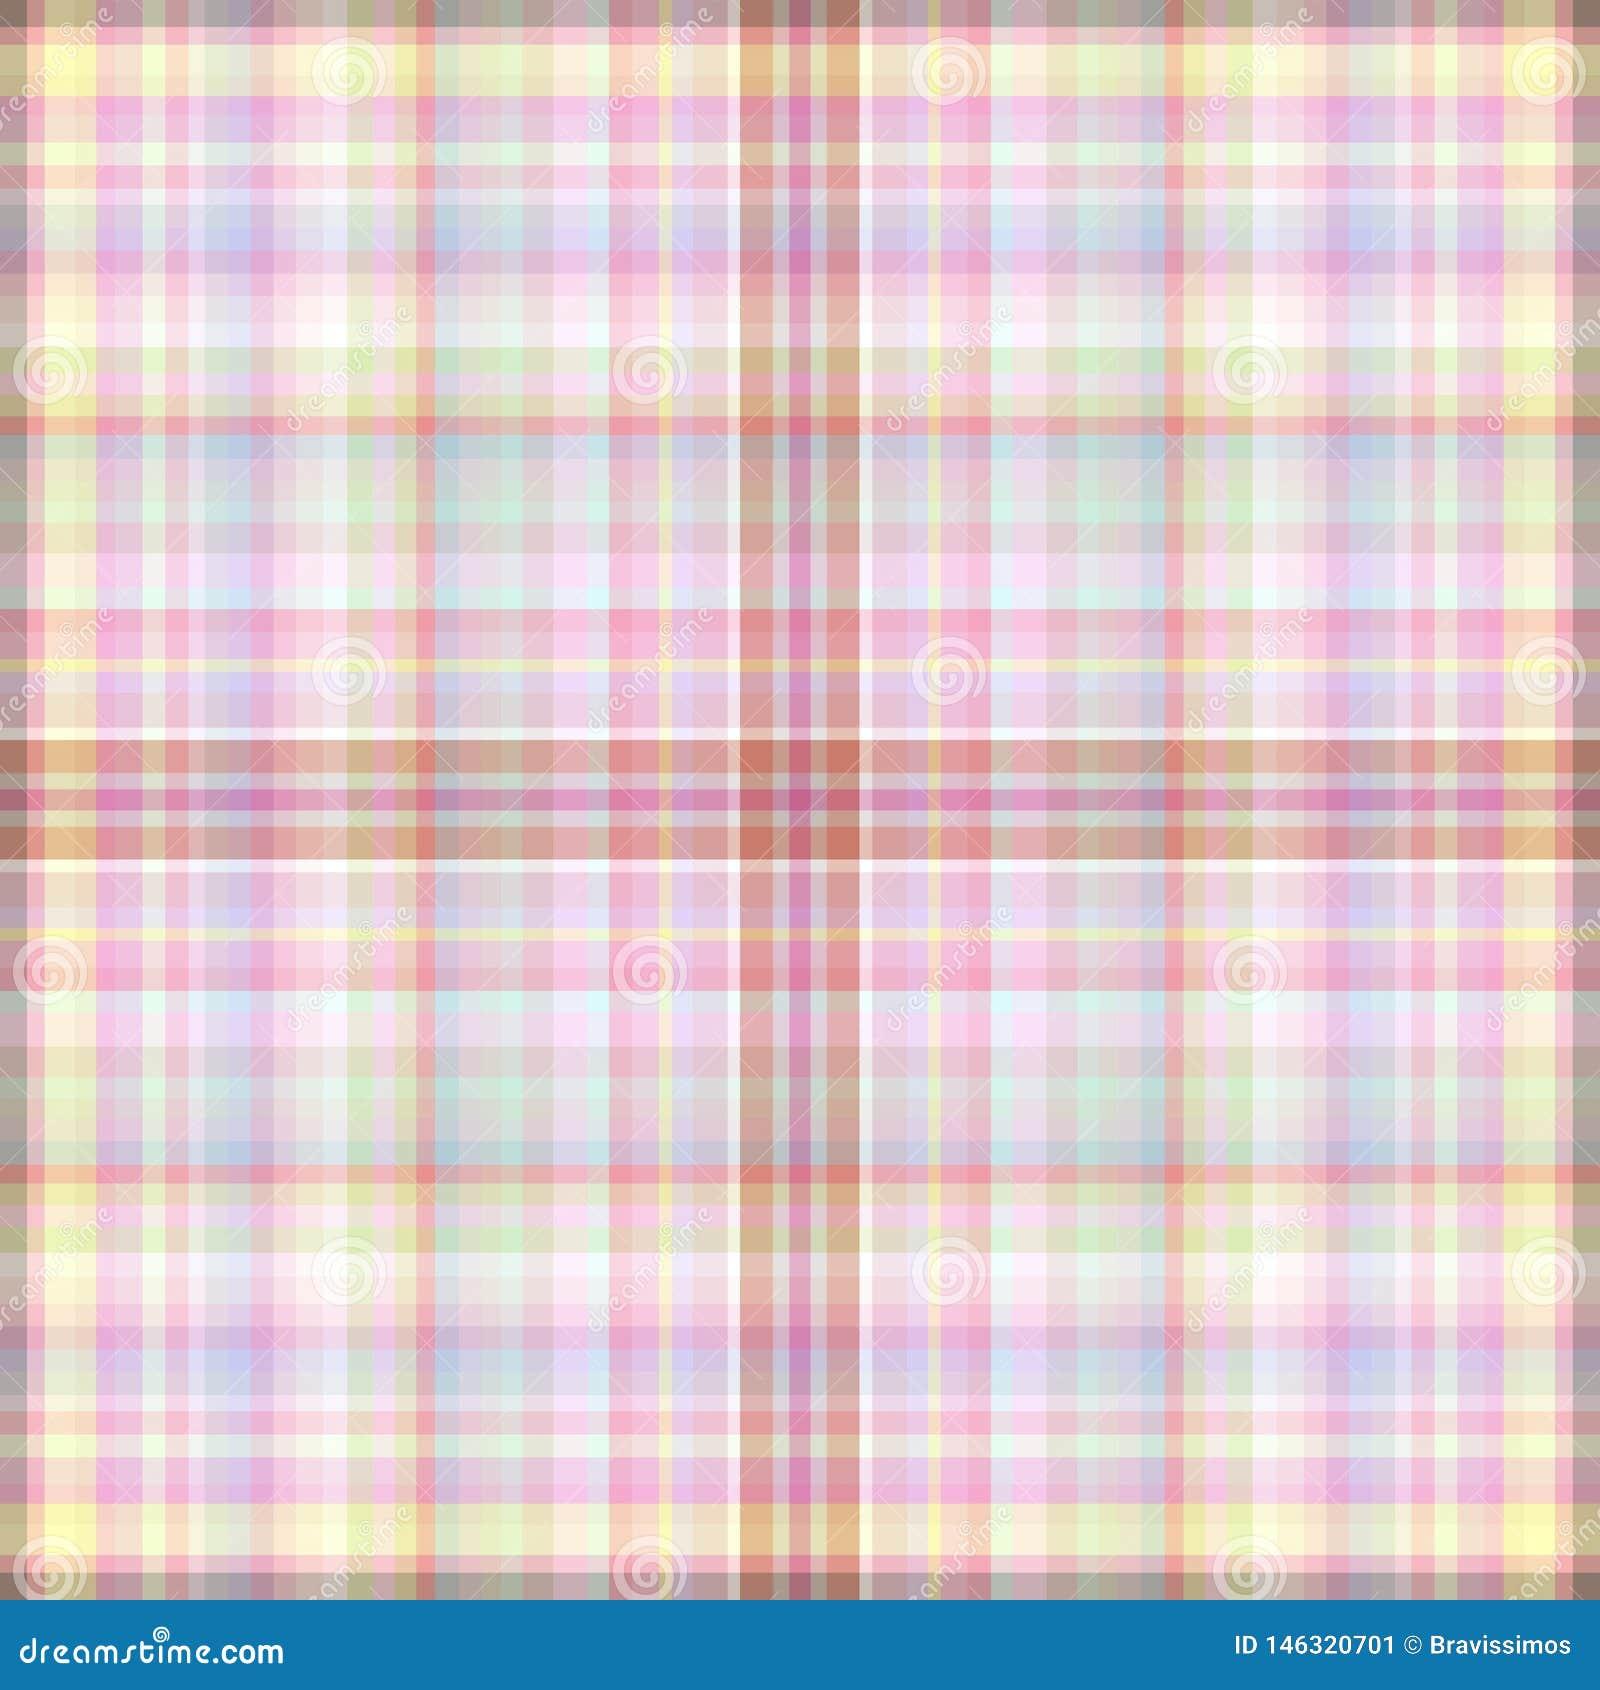 Графический вид решетки, цифровой квадрат стиль фона